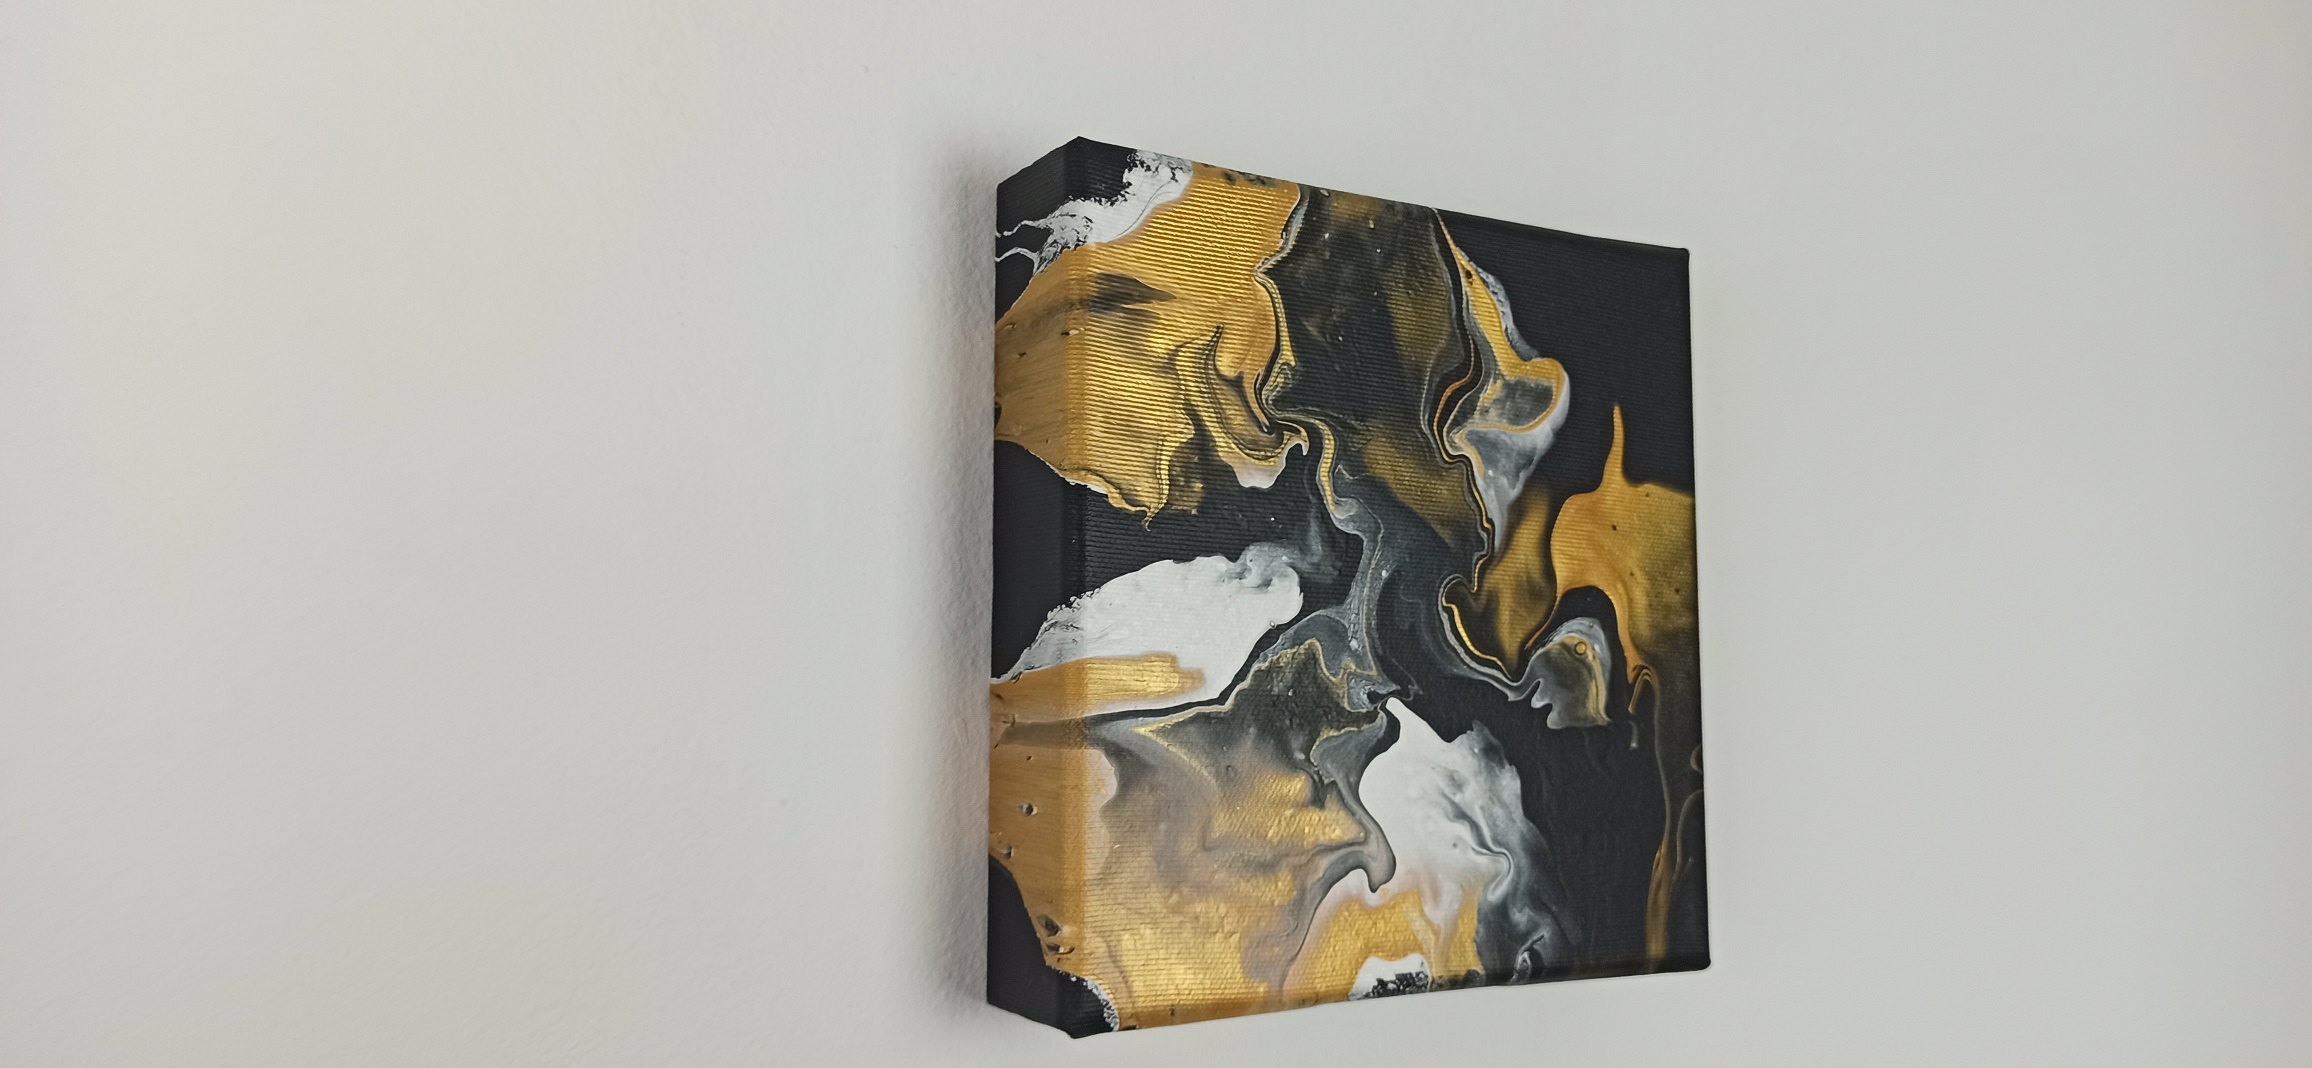 Abstrakt Bild Schwarzes Gold 3D Leinwand